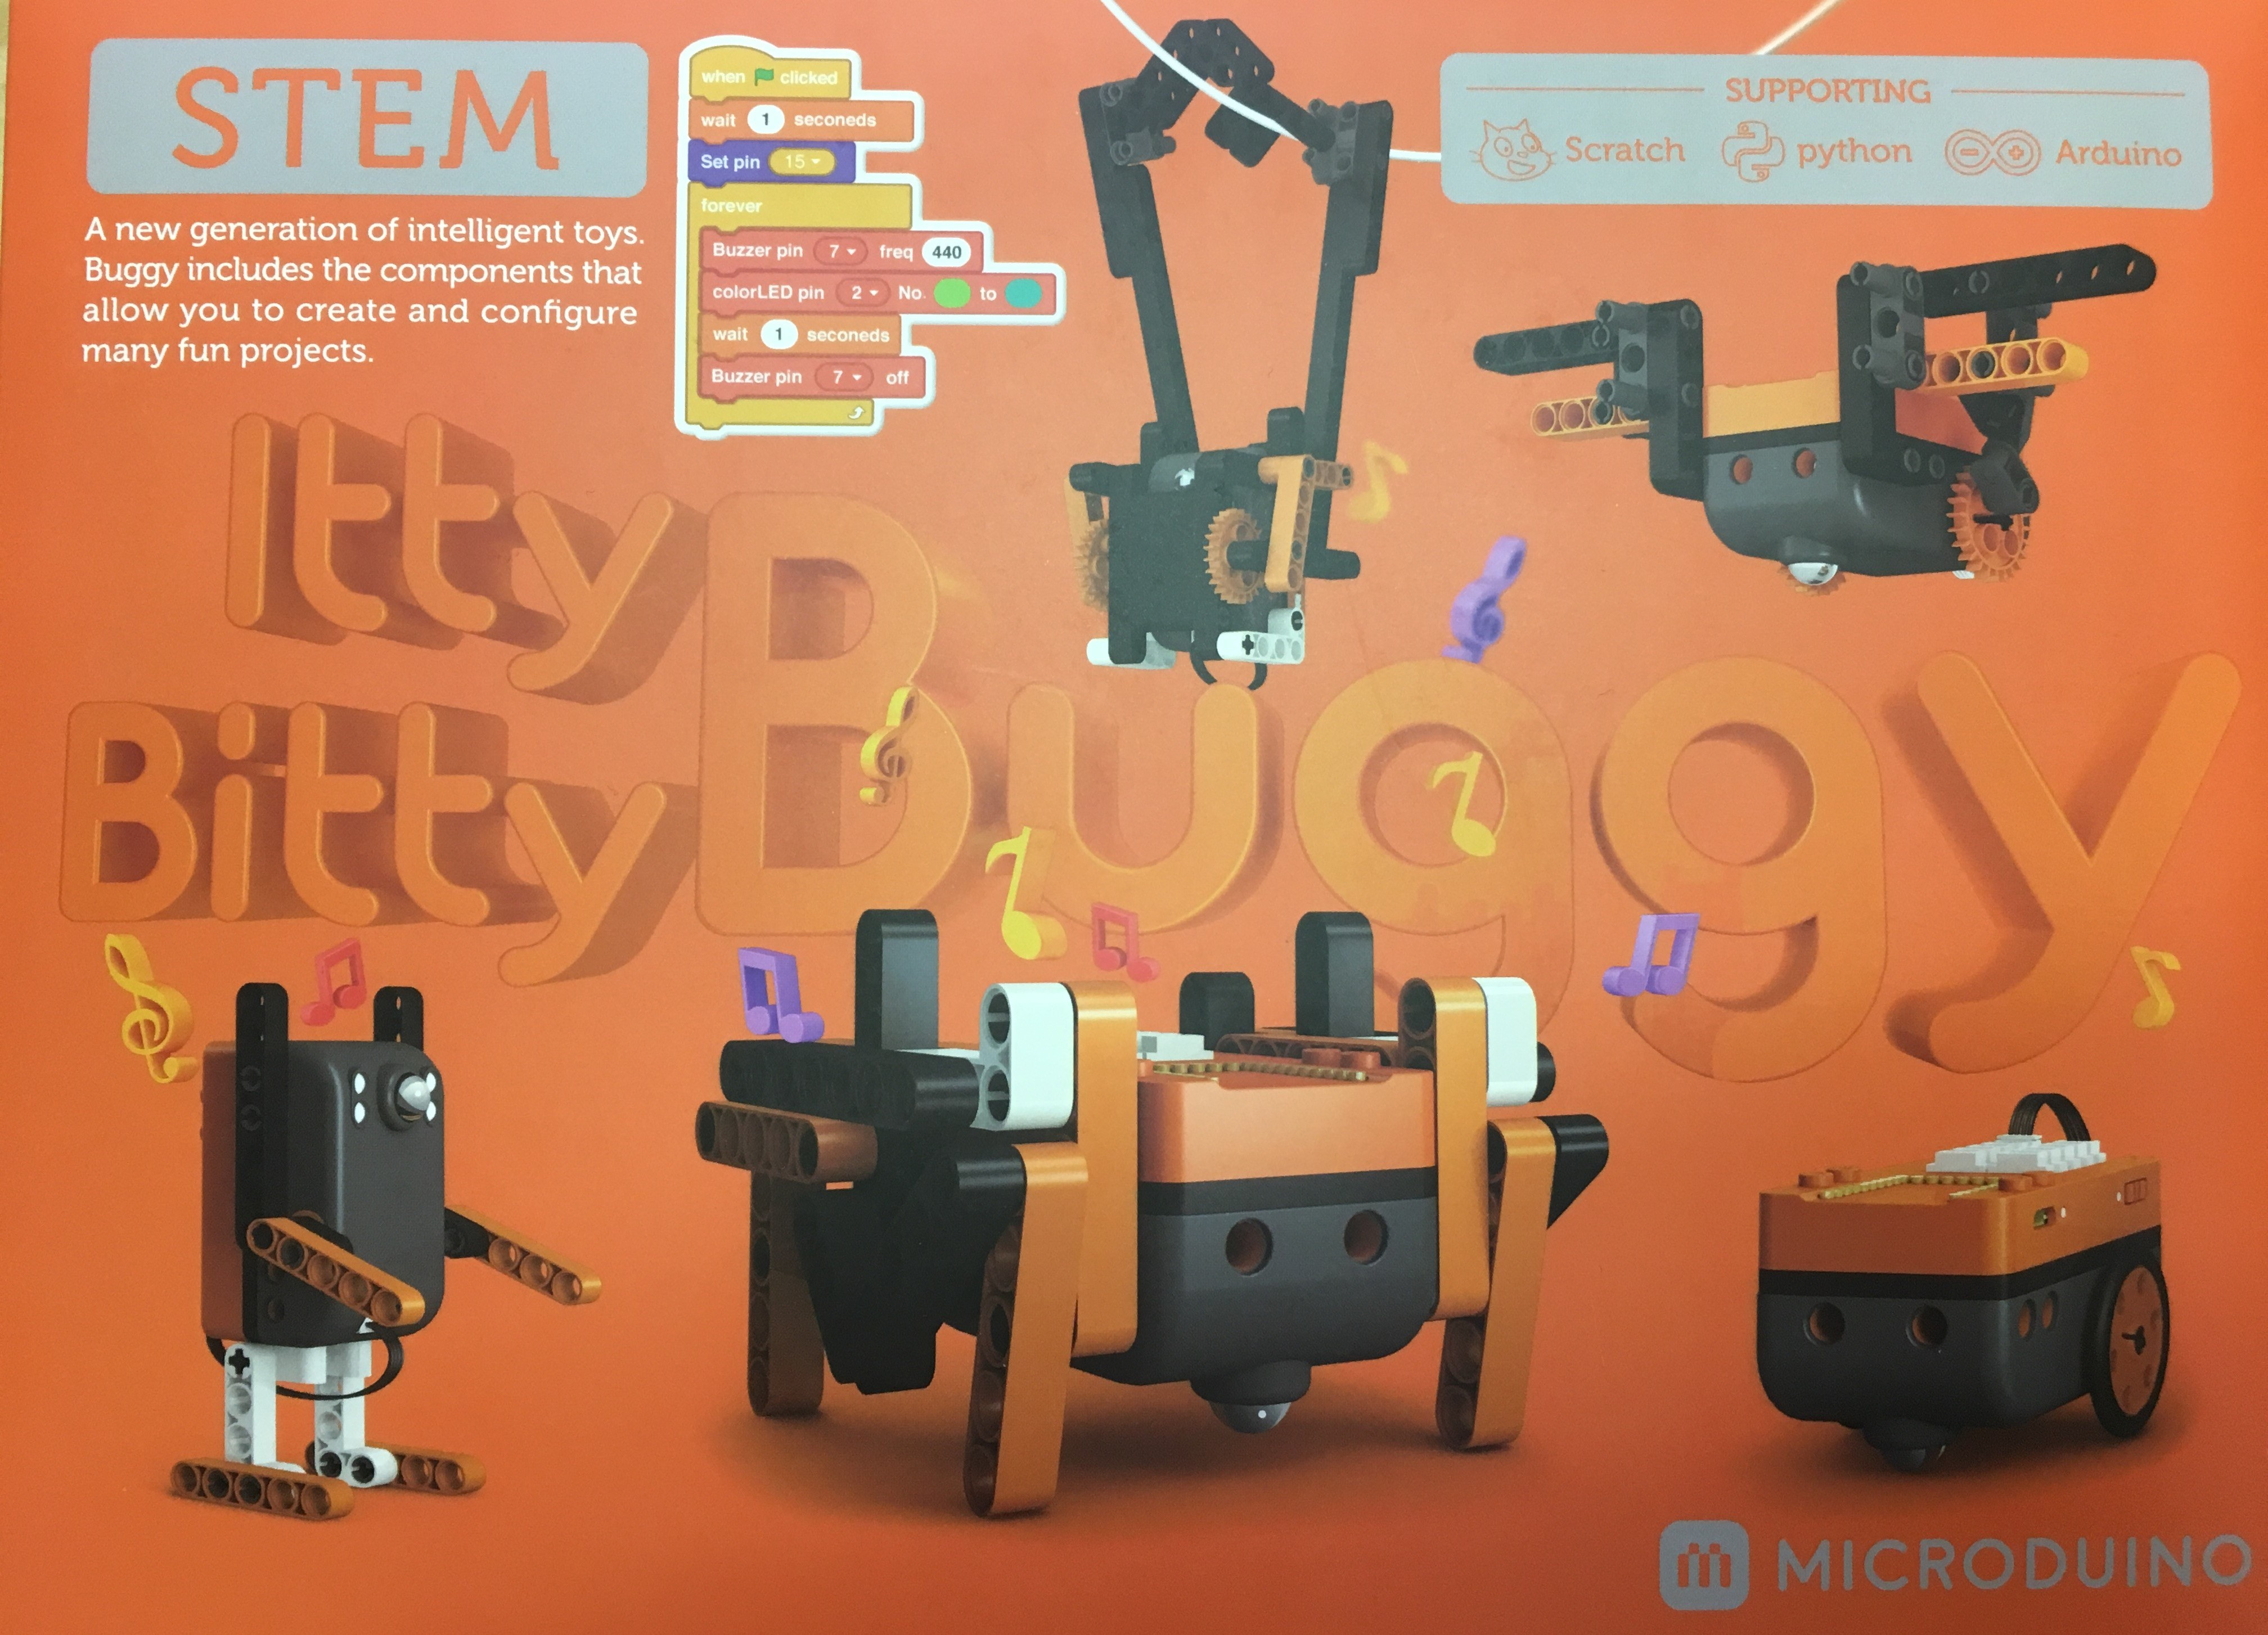 Microduino Itty Bitty Buggy